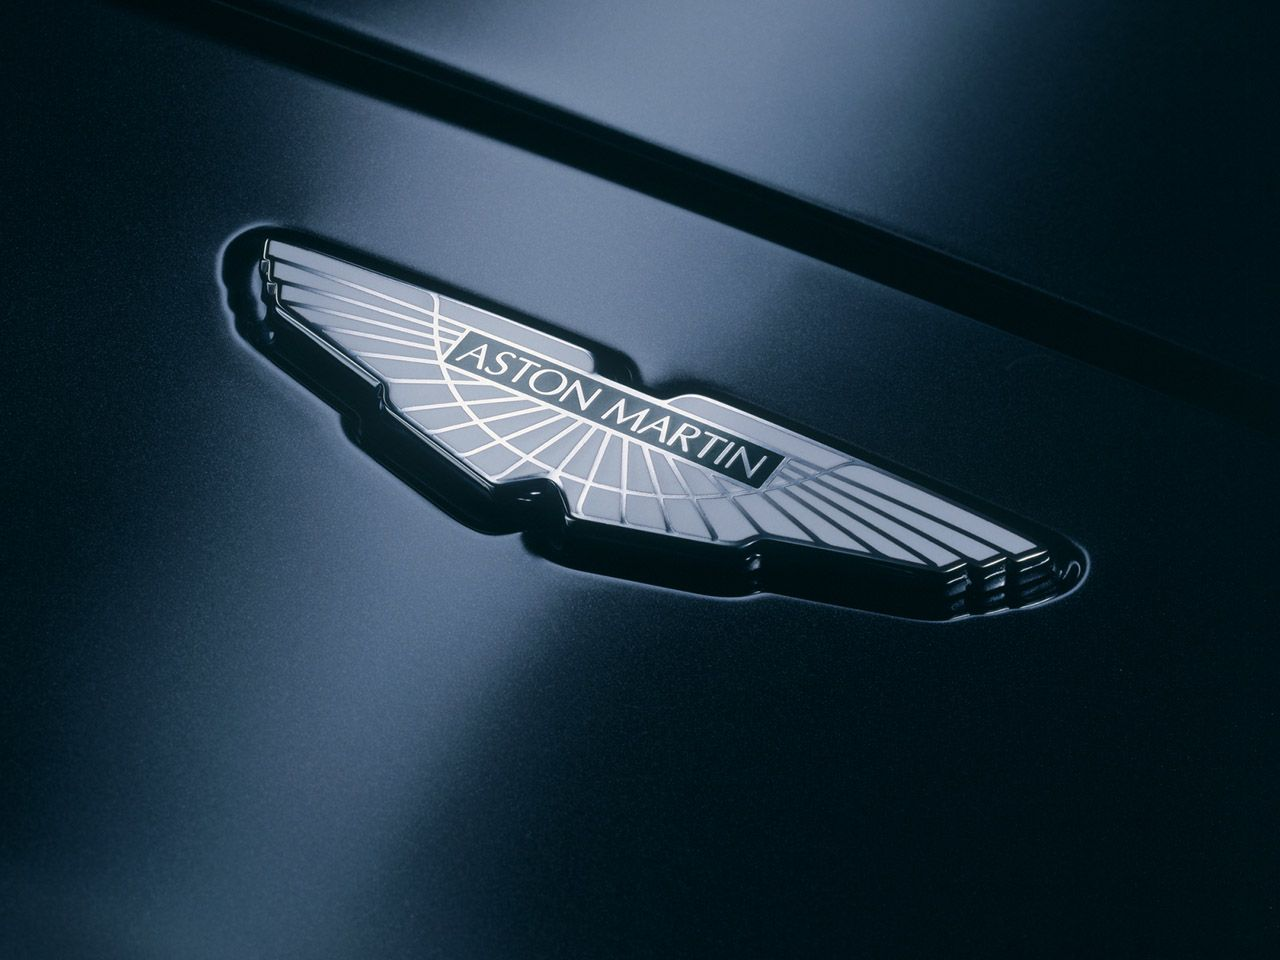 Free Car Logos Aston Martin Logo Aston Martin Vulcan Aston Martin Cars Aston Martin Vanquish